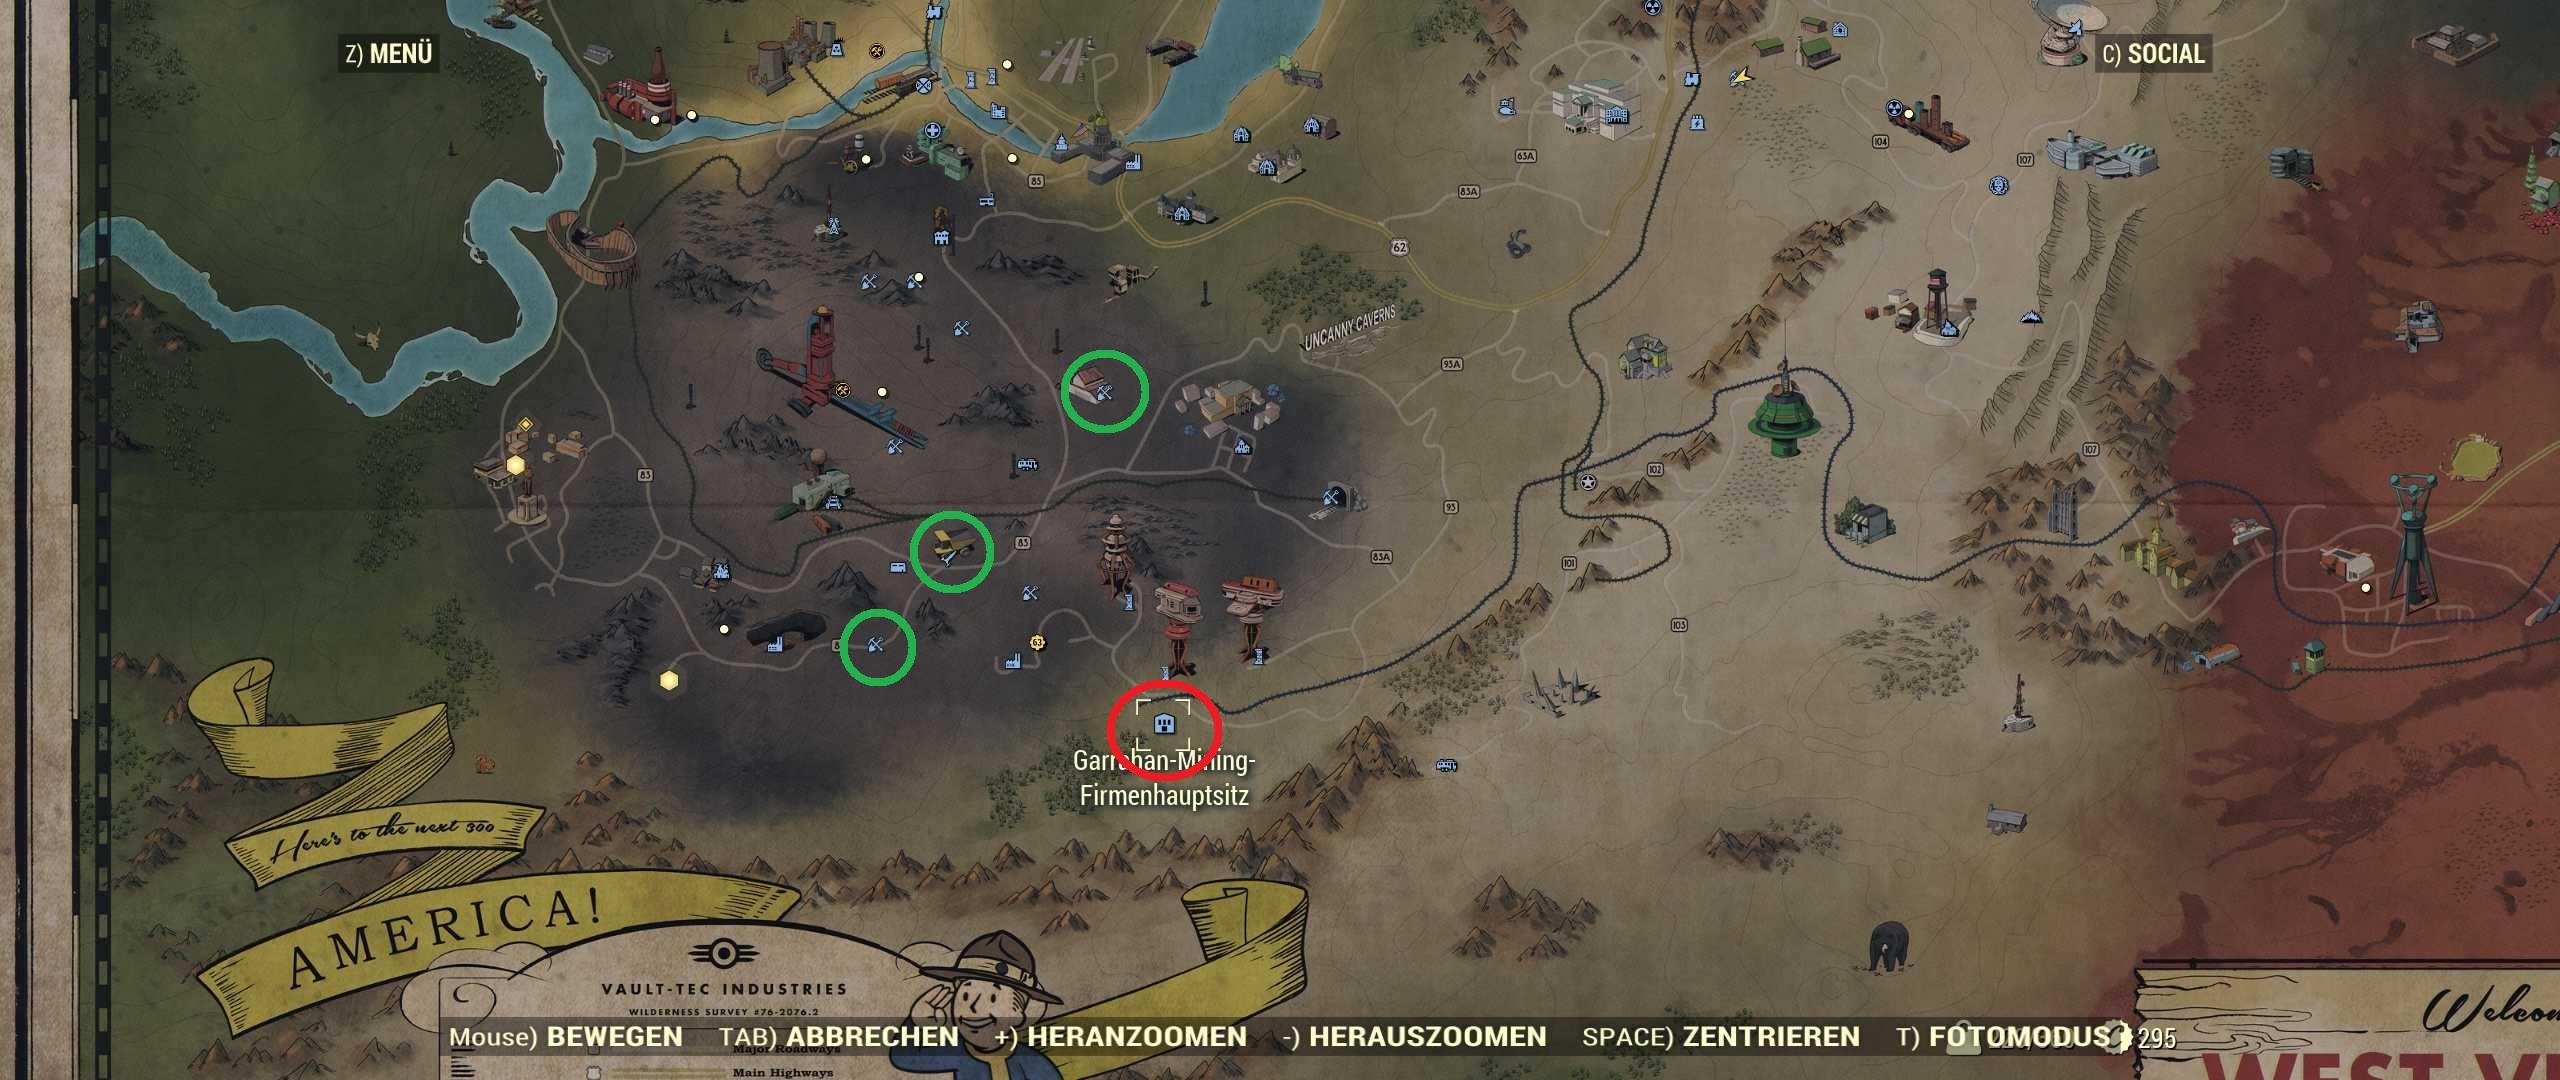 Fallout 76 Karte Deutsch.Fallout 76 So Kommt Ihr Leicht An Das Seltene Schwarze Titan